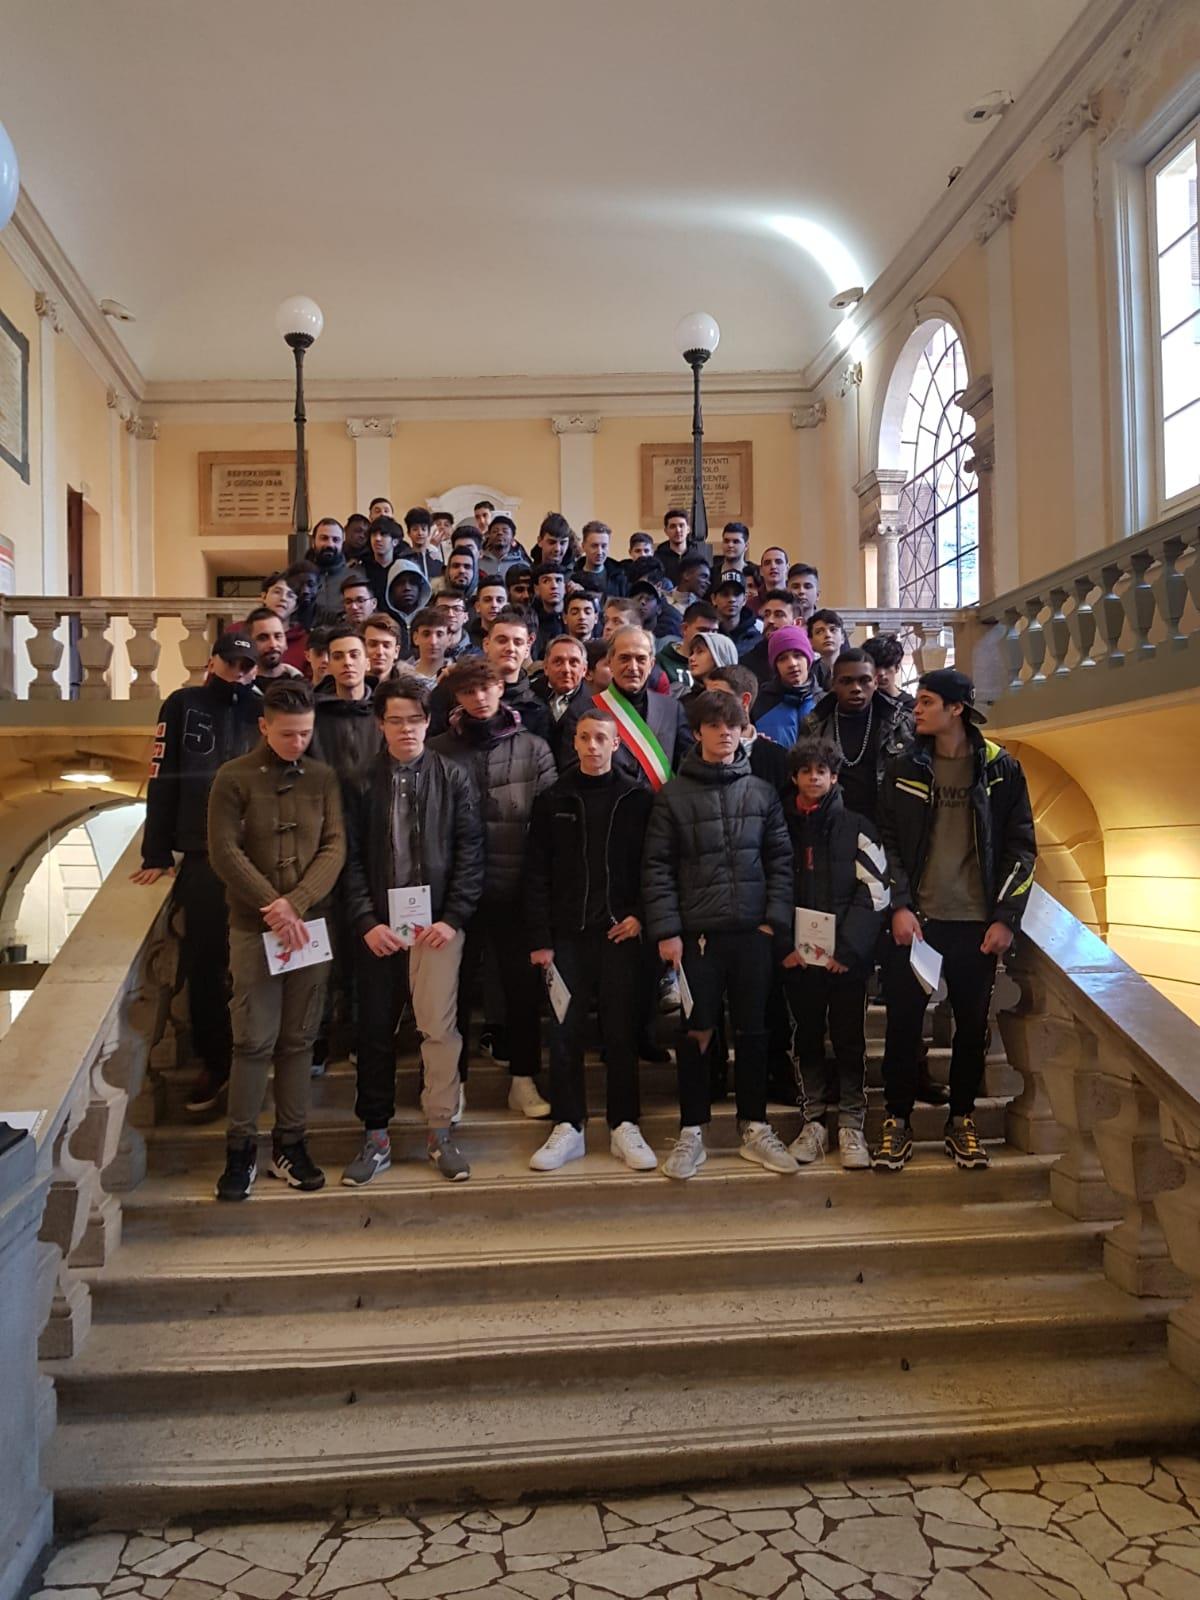 Consegna-Costituzione-Italiana-a-una-classe-di-Forlì